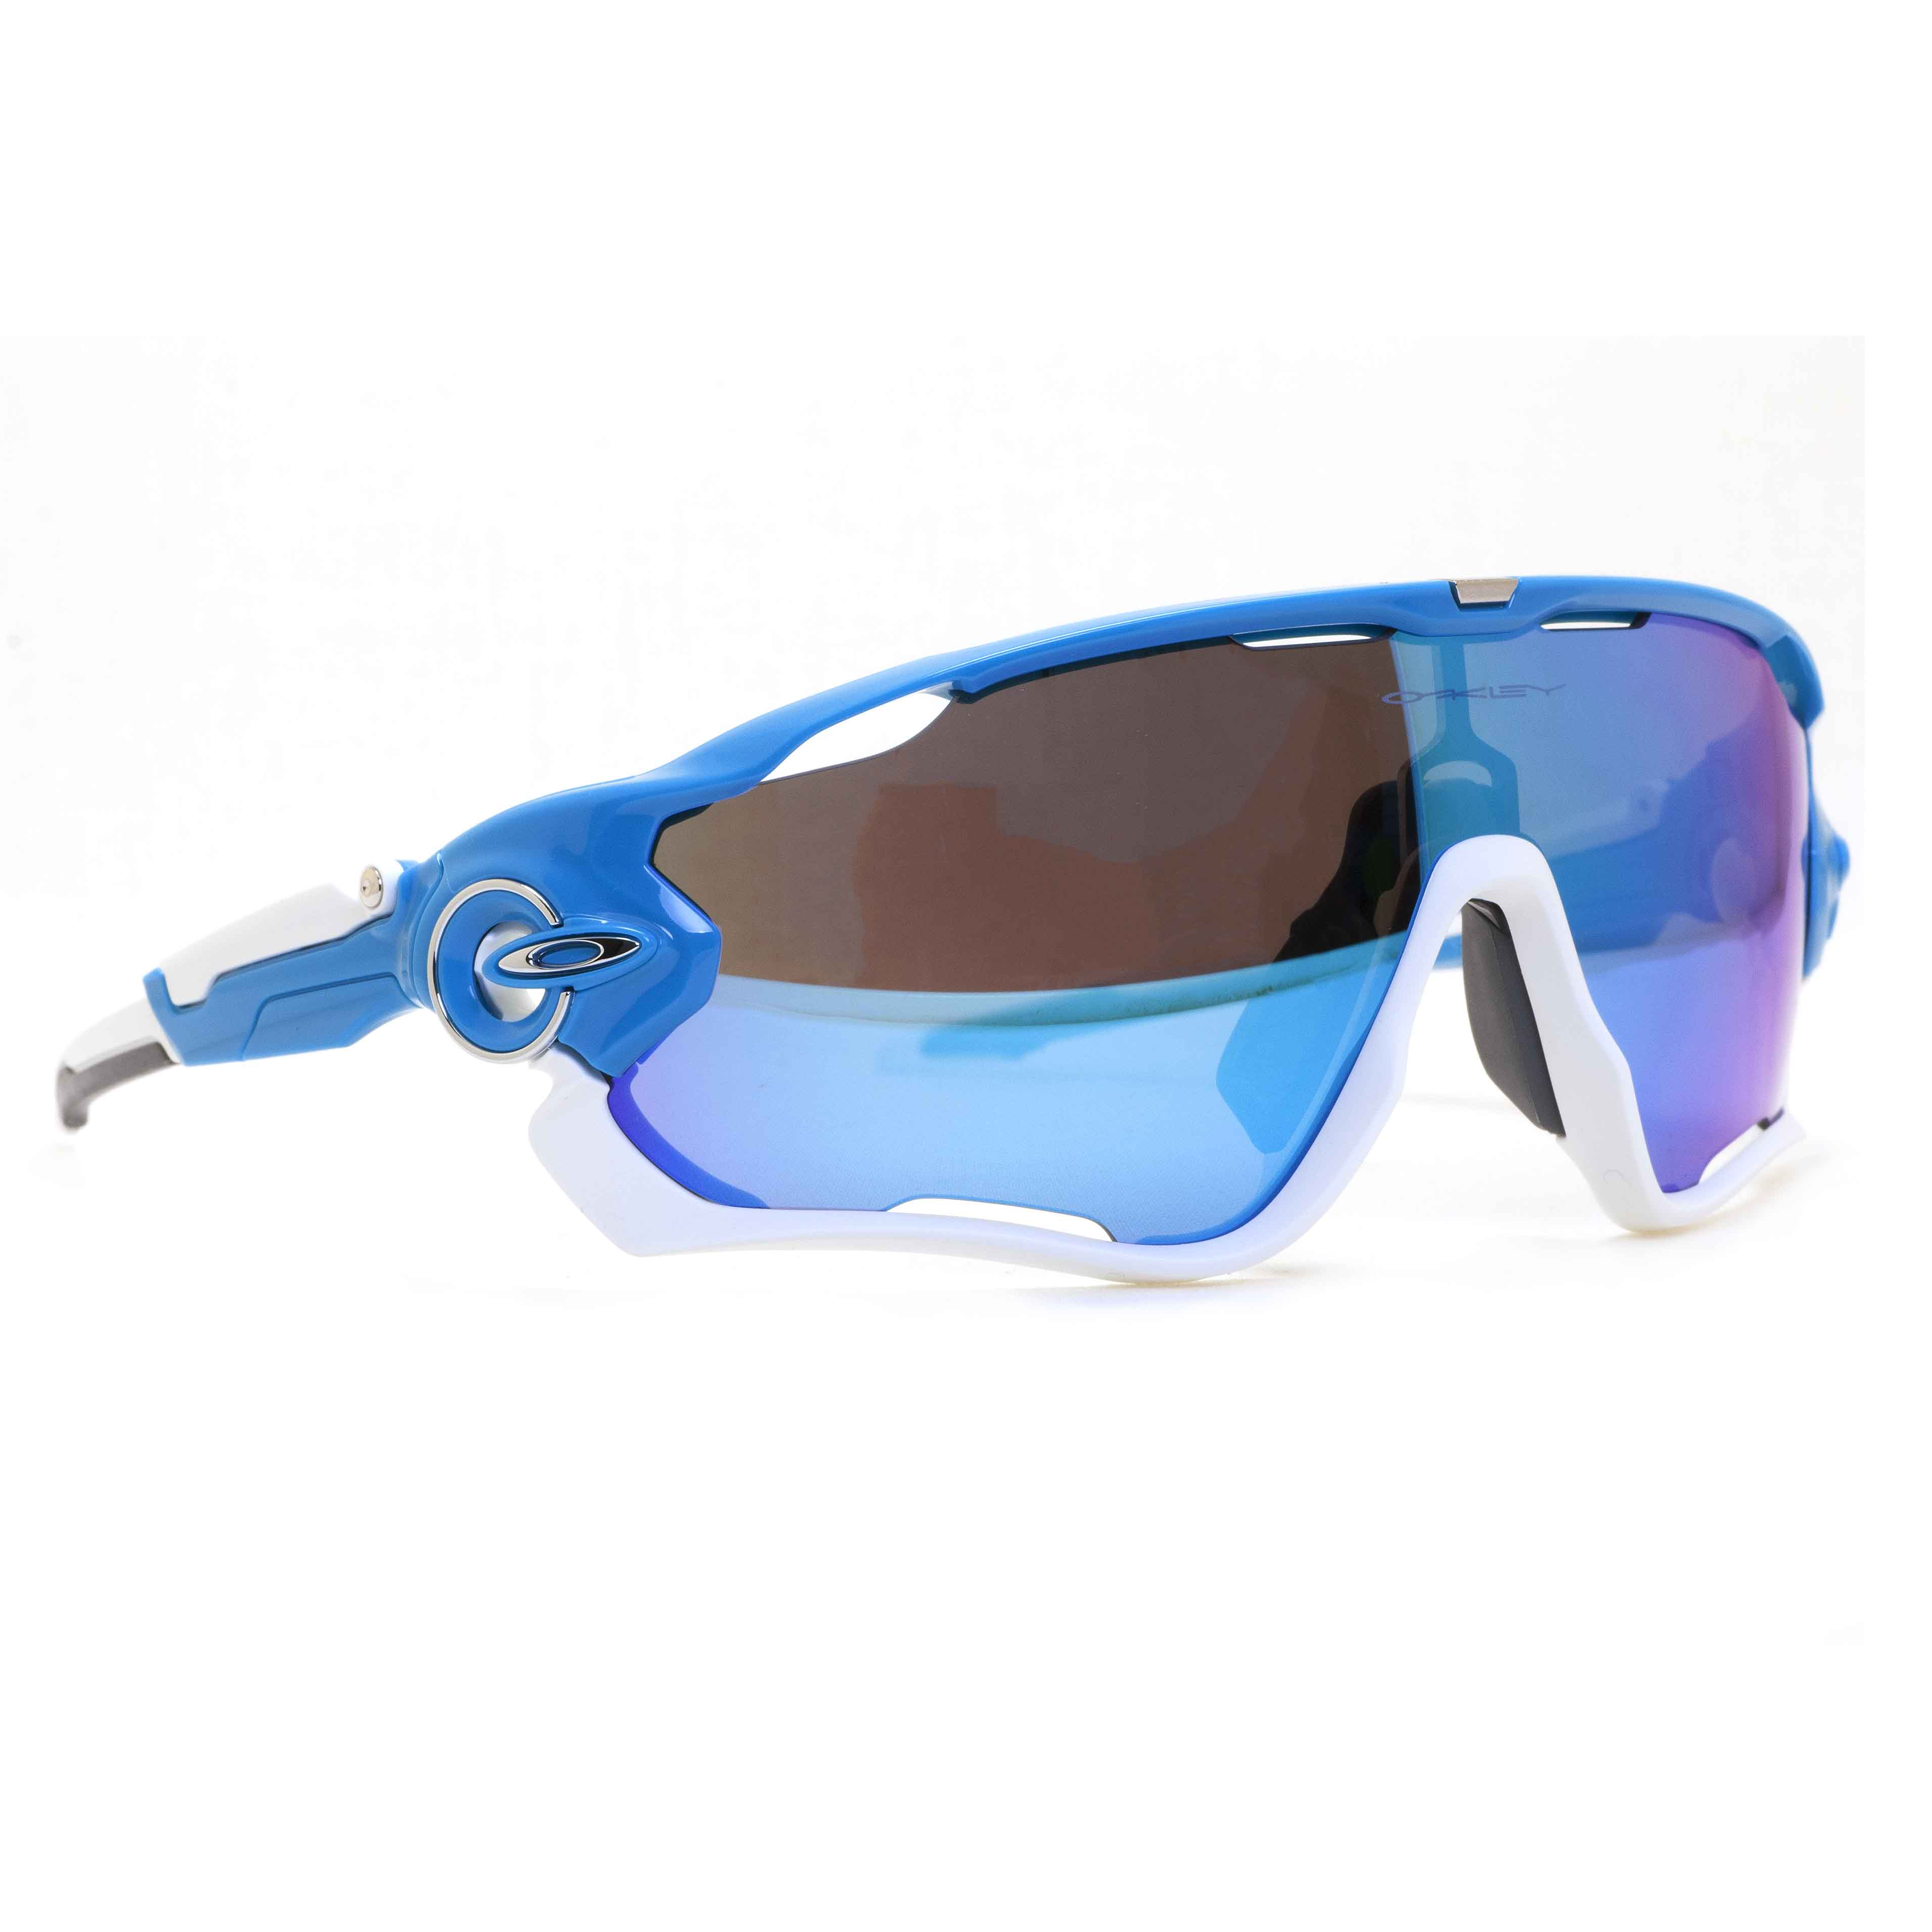 3a23309aff Oakley Script Sapphire Blue